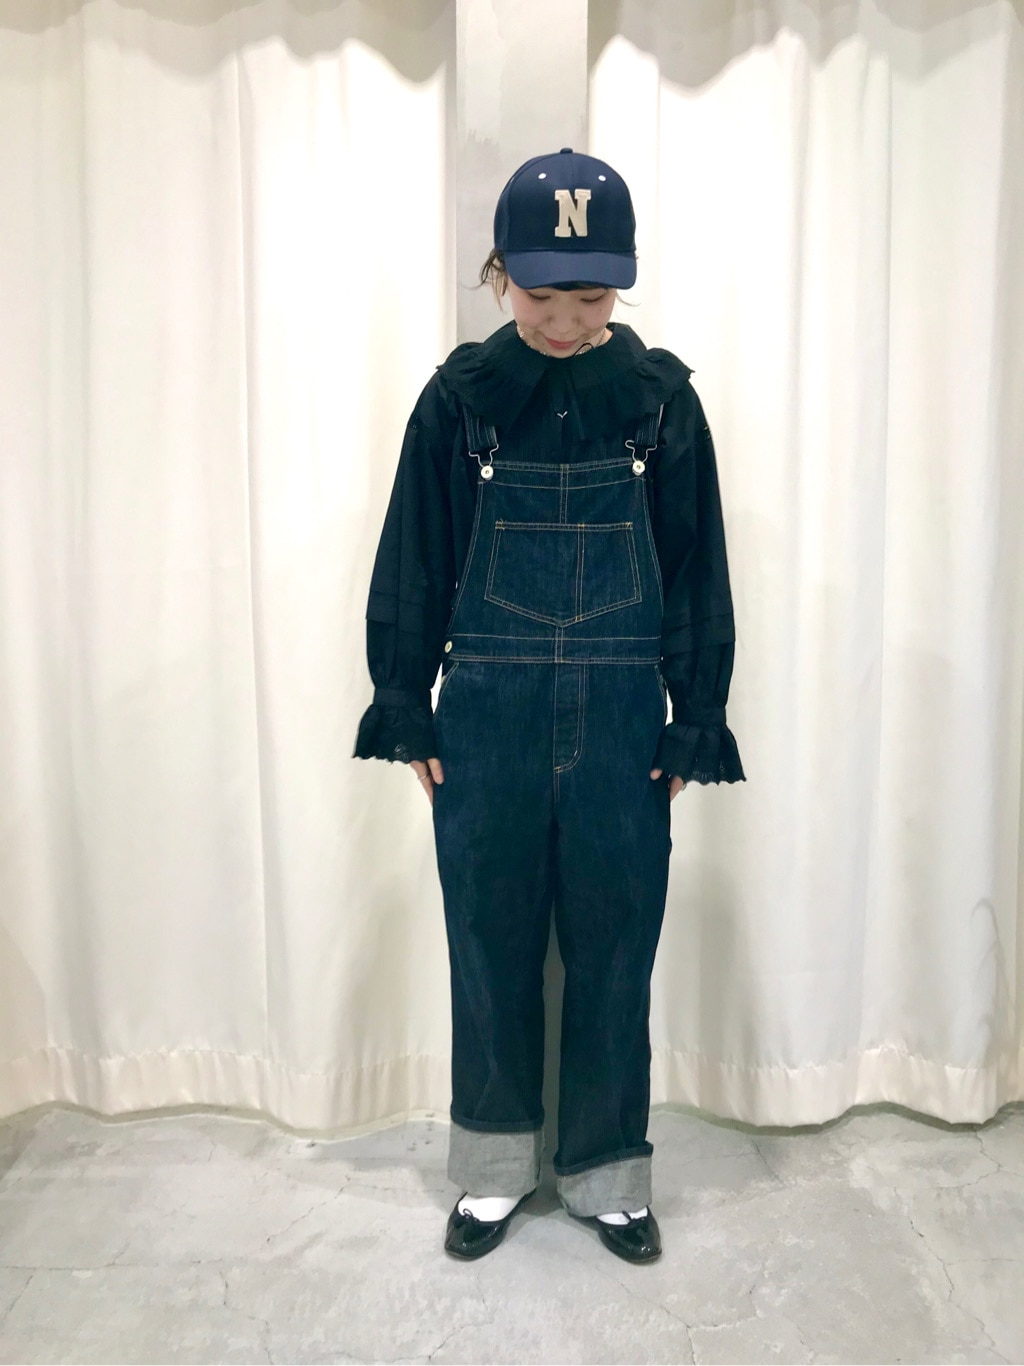 - PAR ICI CHILD WOMAN , PAR ICI 東京スカイツリータウン・ソラマチ 身長:154cm 2020.08.25